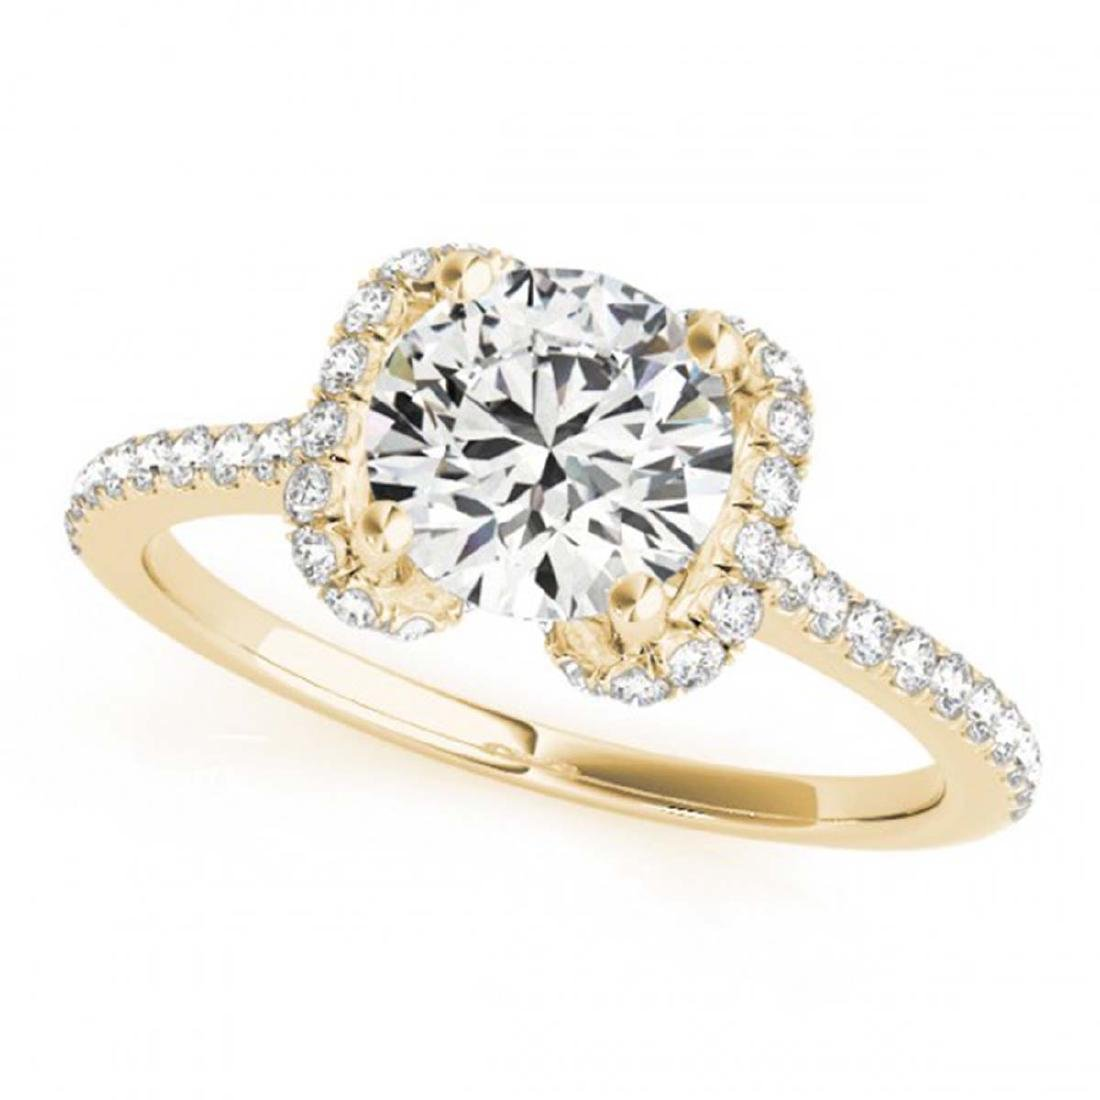 1.33 ctw VS/SI Diamond Halo Ring 18K Yellow Gold - - 2